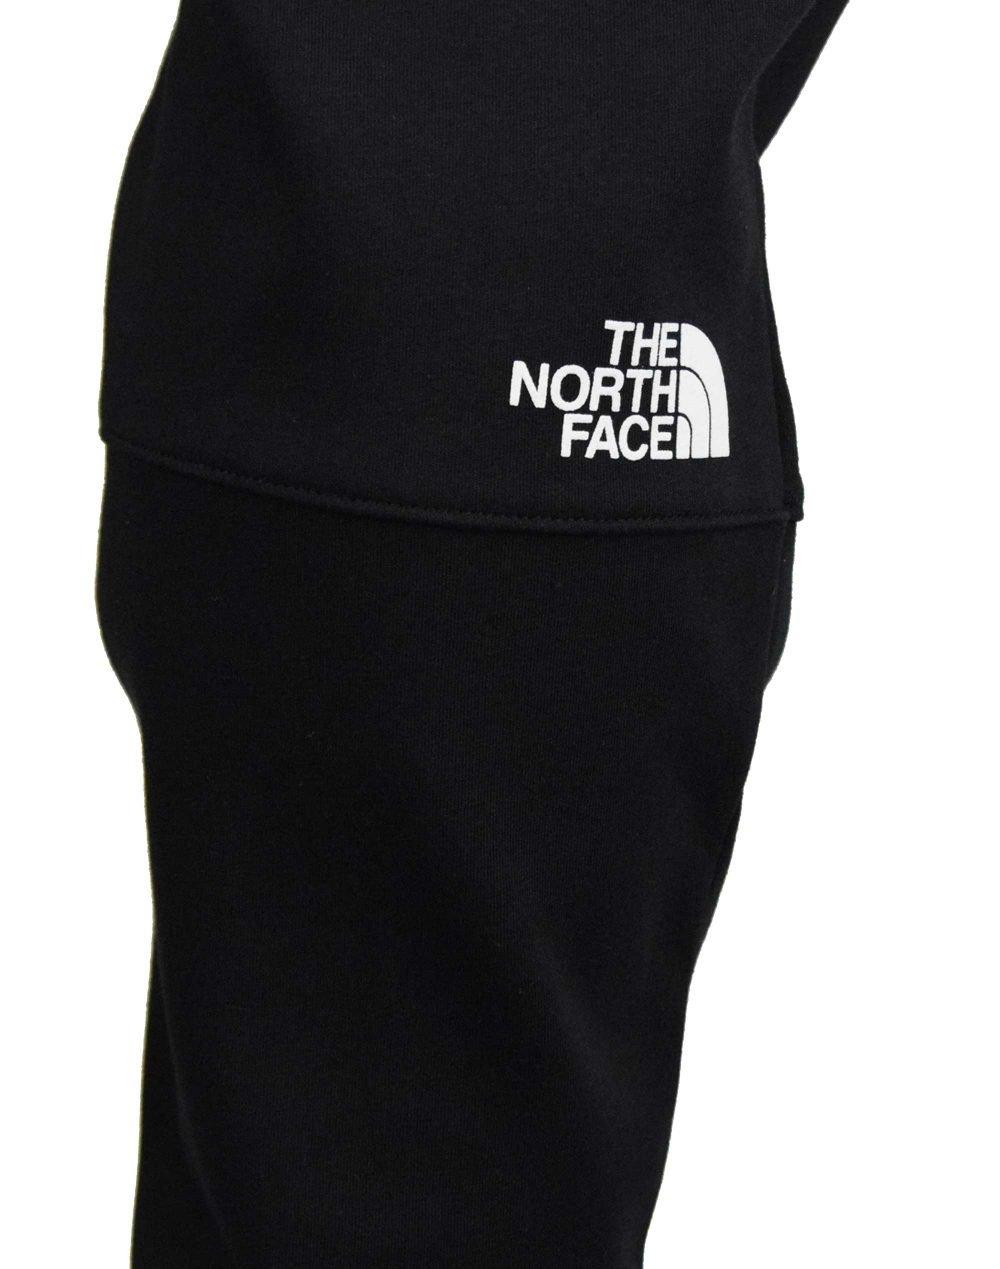 The North Face Fine 2 Pant (NF0A3BPOJK31) Black